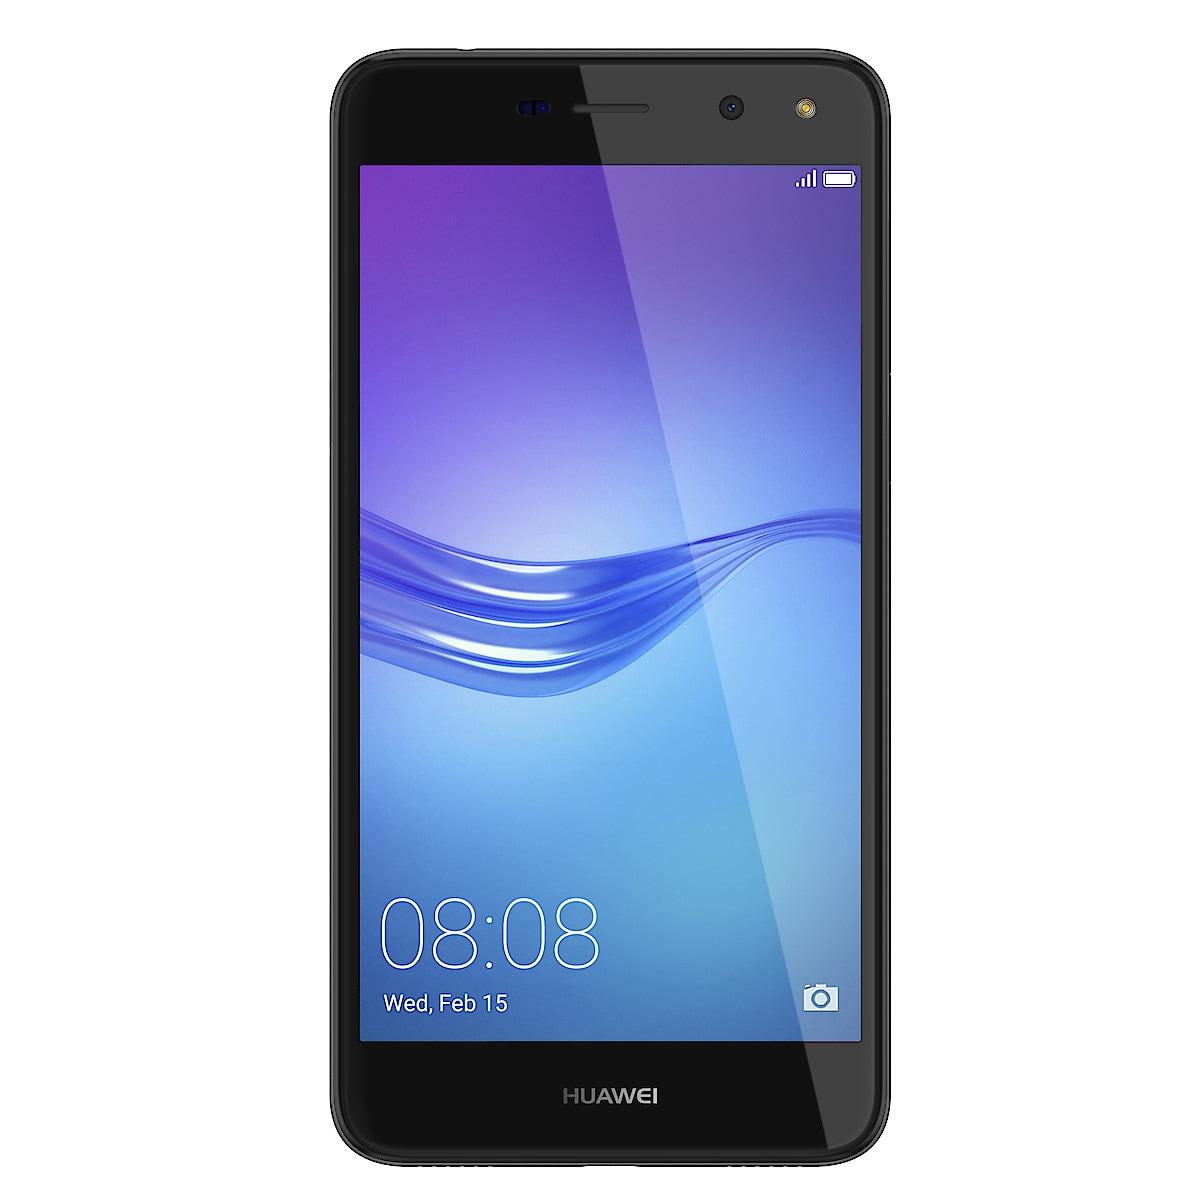 Mobiltelefon Huawei Y6 (2017)